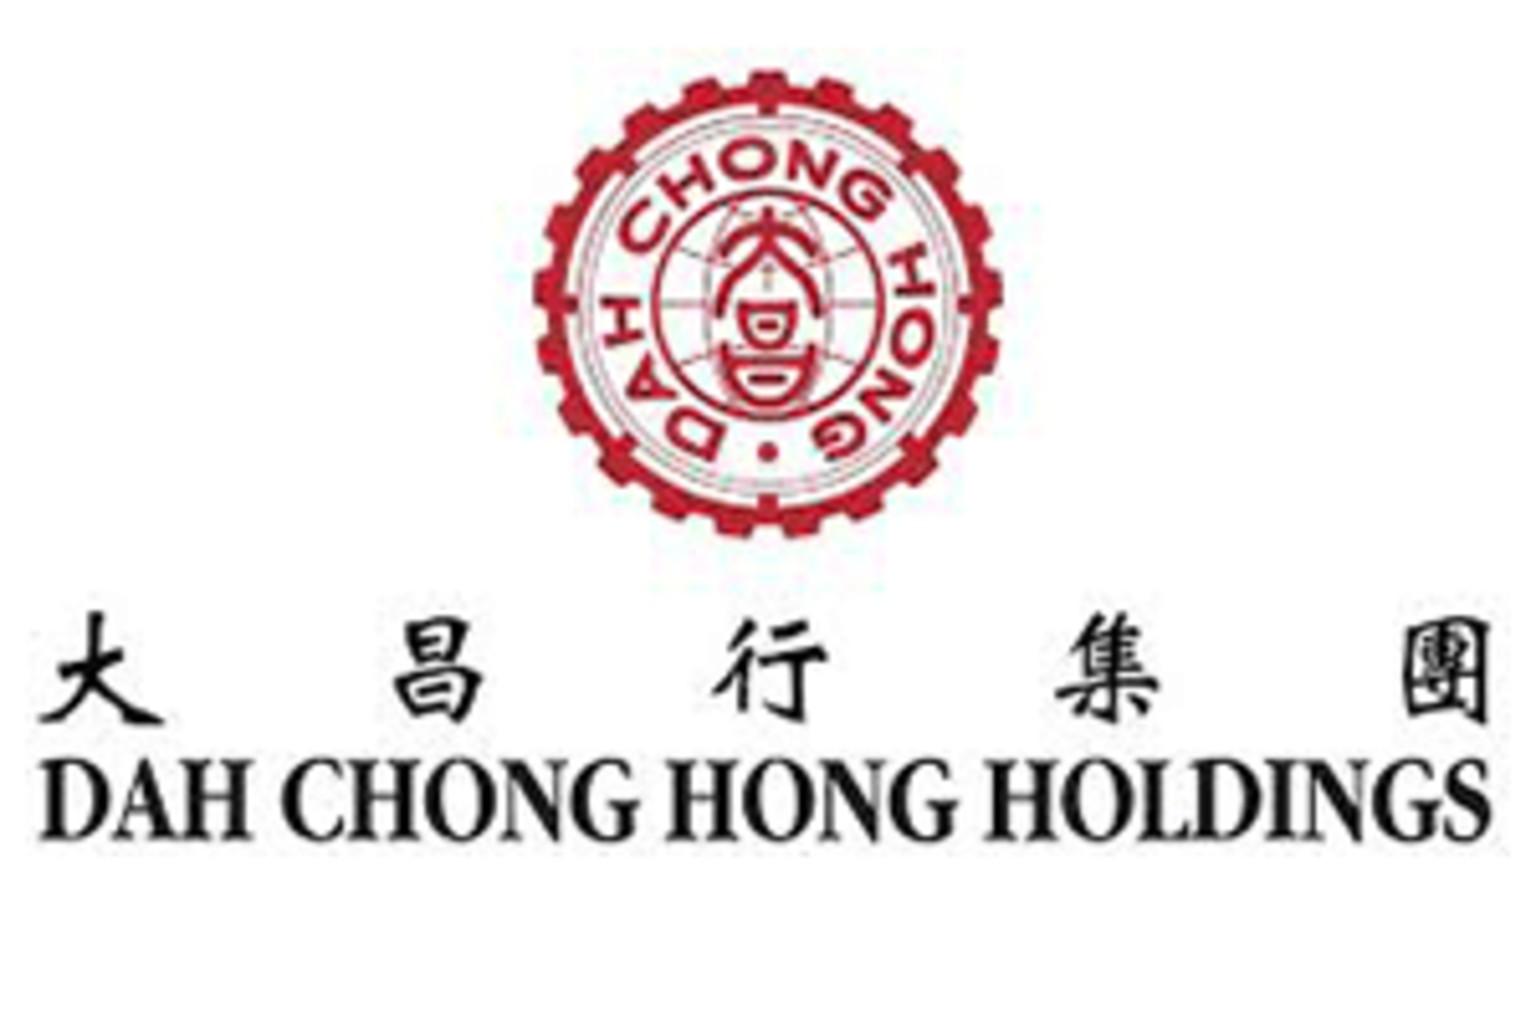 dah_chong_hong_holdings_image